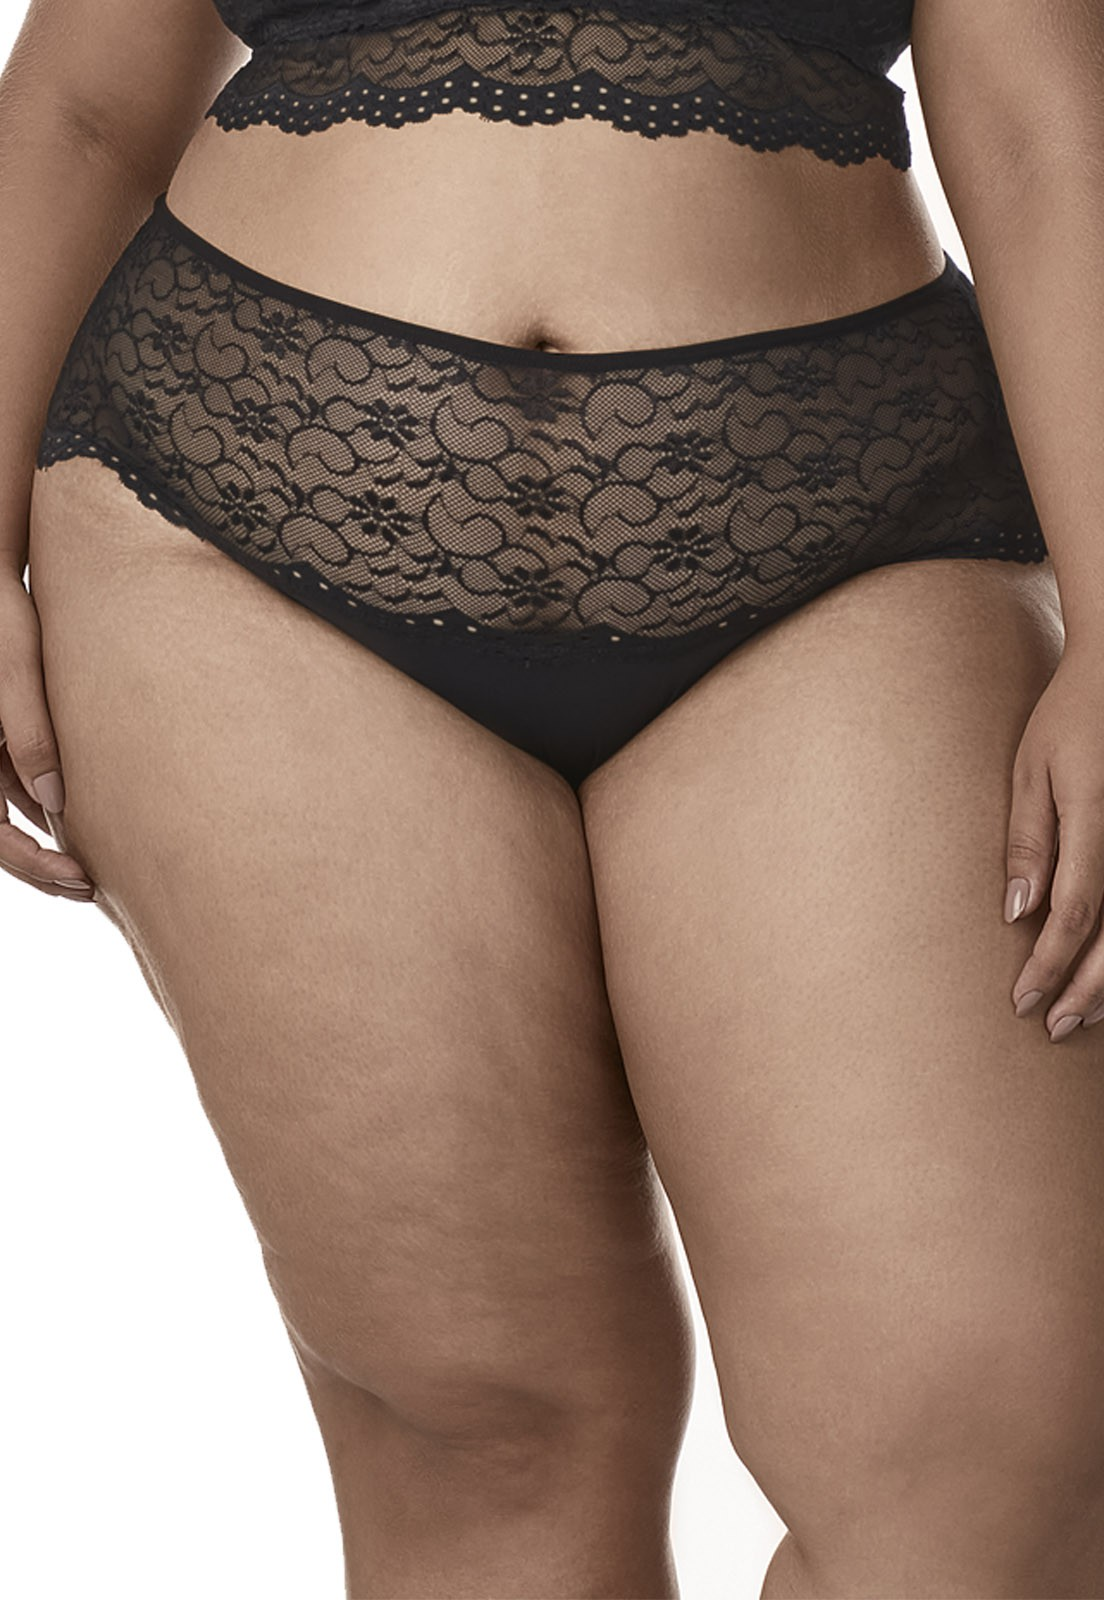 Calcinha cós de Renda - Dukley Lingerie - Plus Size - 170